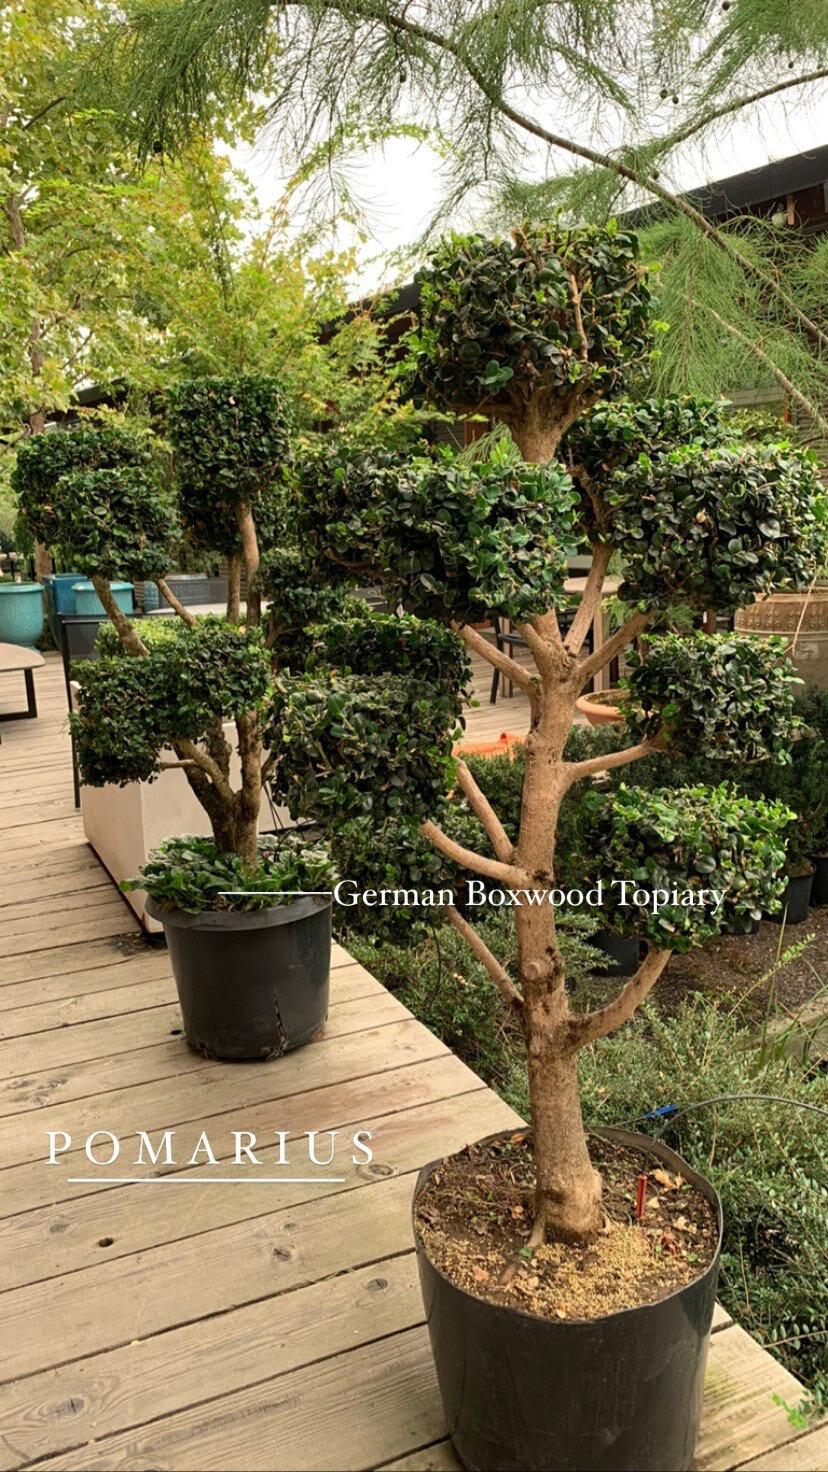 Boxwoods Topiary Pomarius Nursery Plants With Character